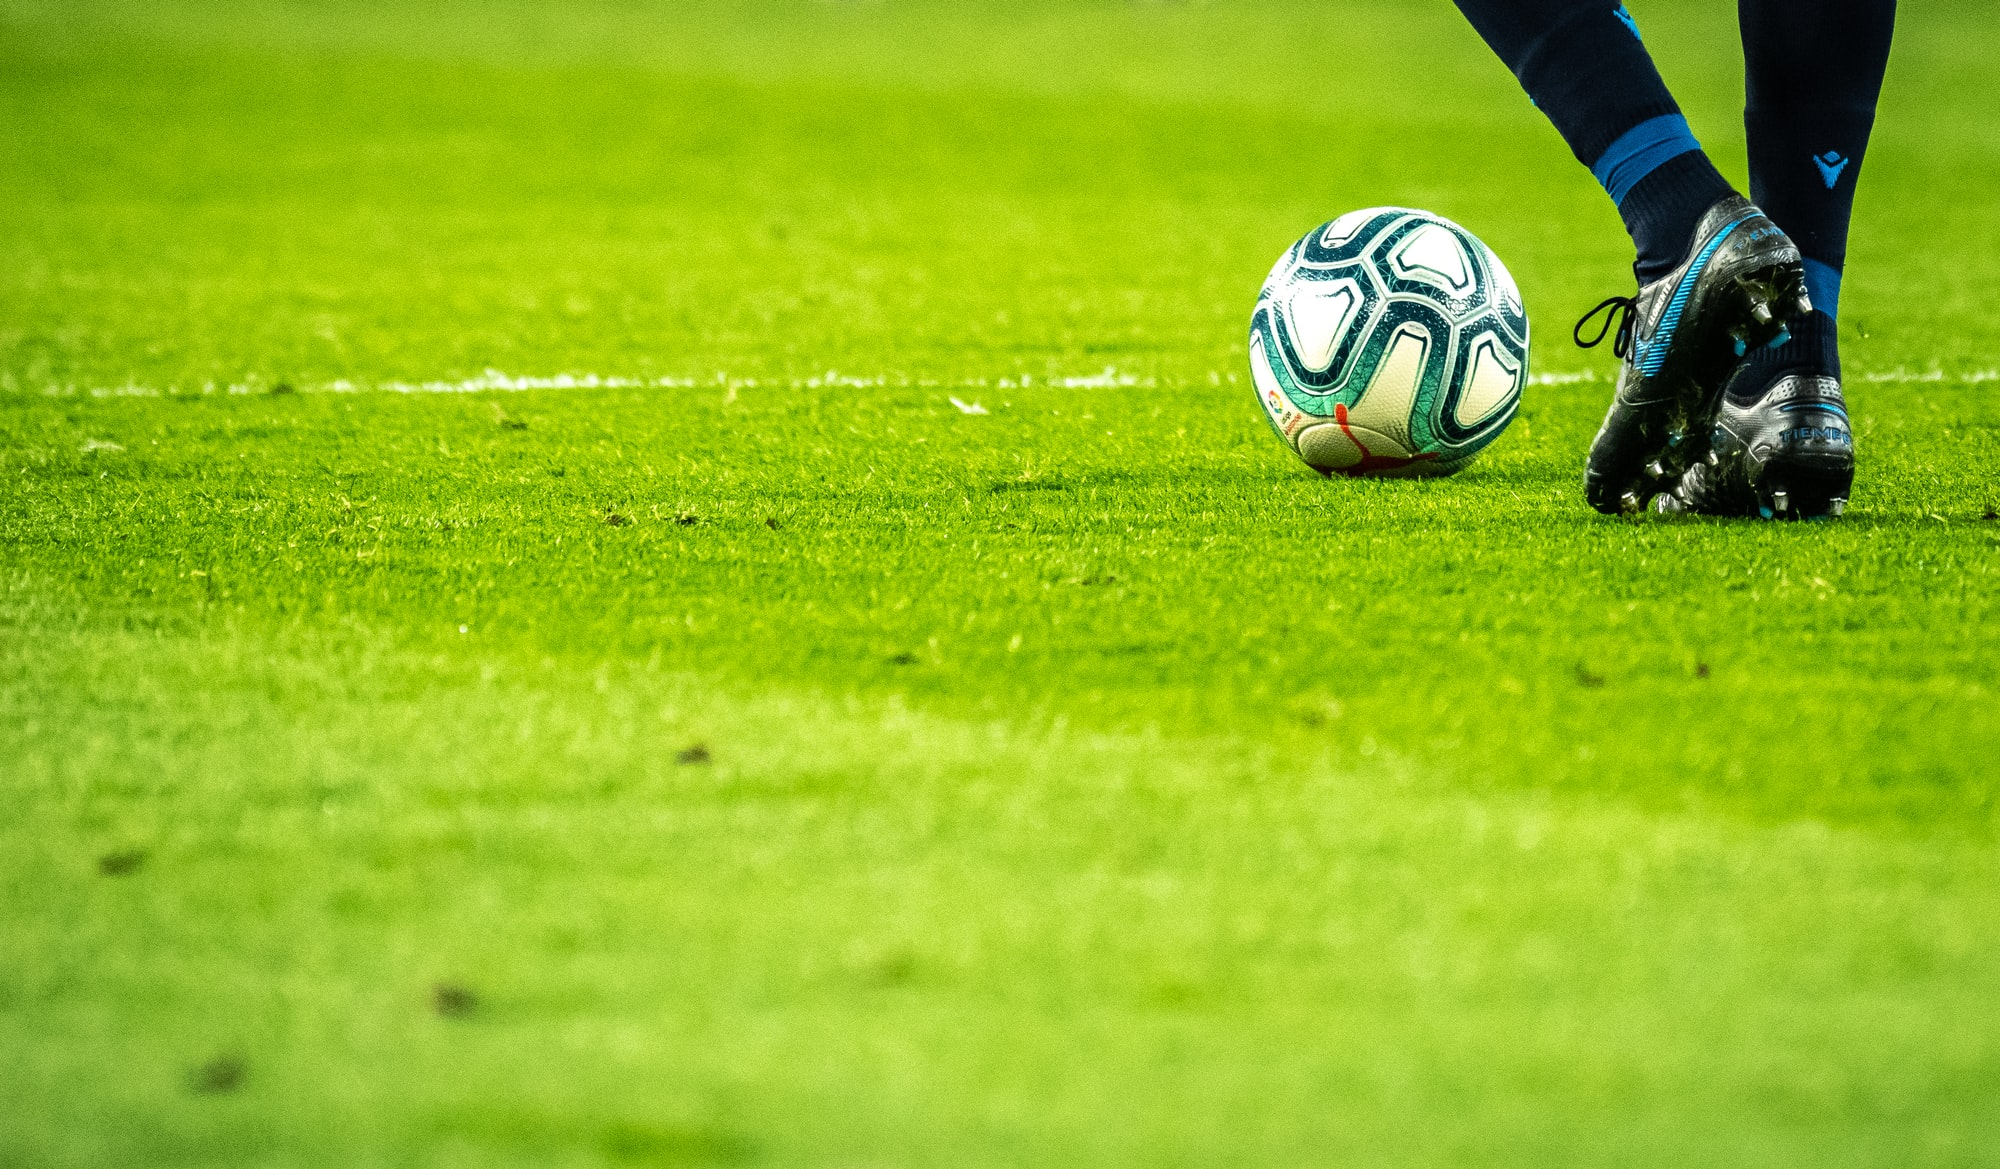 Pronostici ottavi Champions League: schedina oggi 17/03/2021